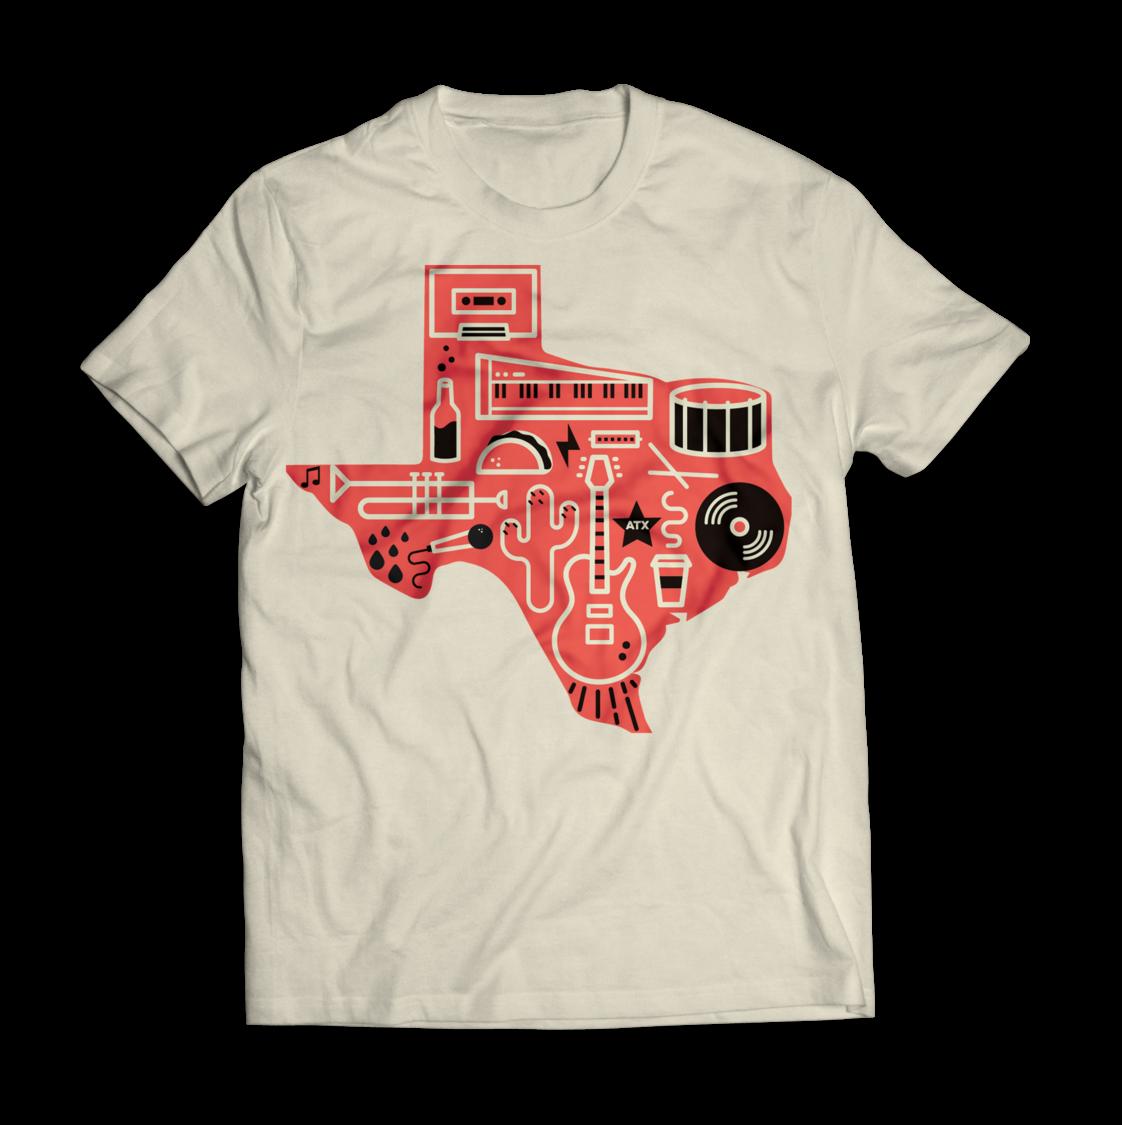 ATX_Shirt.png